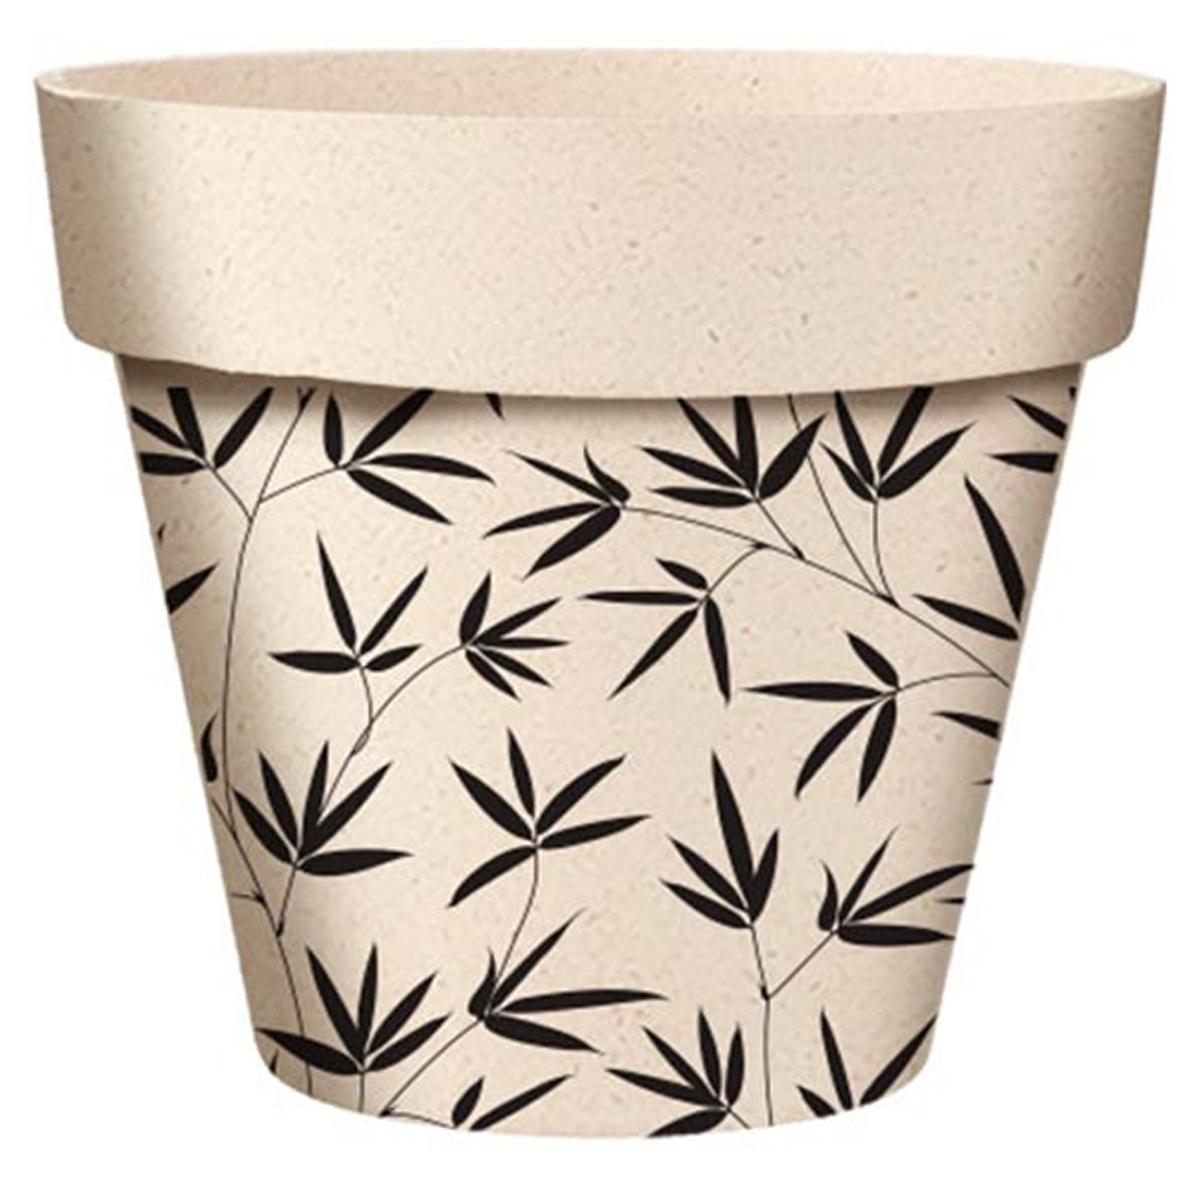 Cache-pot bambou \'Bambou\' noir beige - 255x24 cm - [A2046]